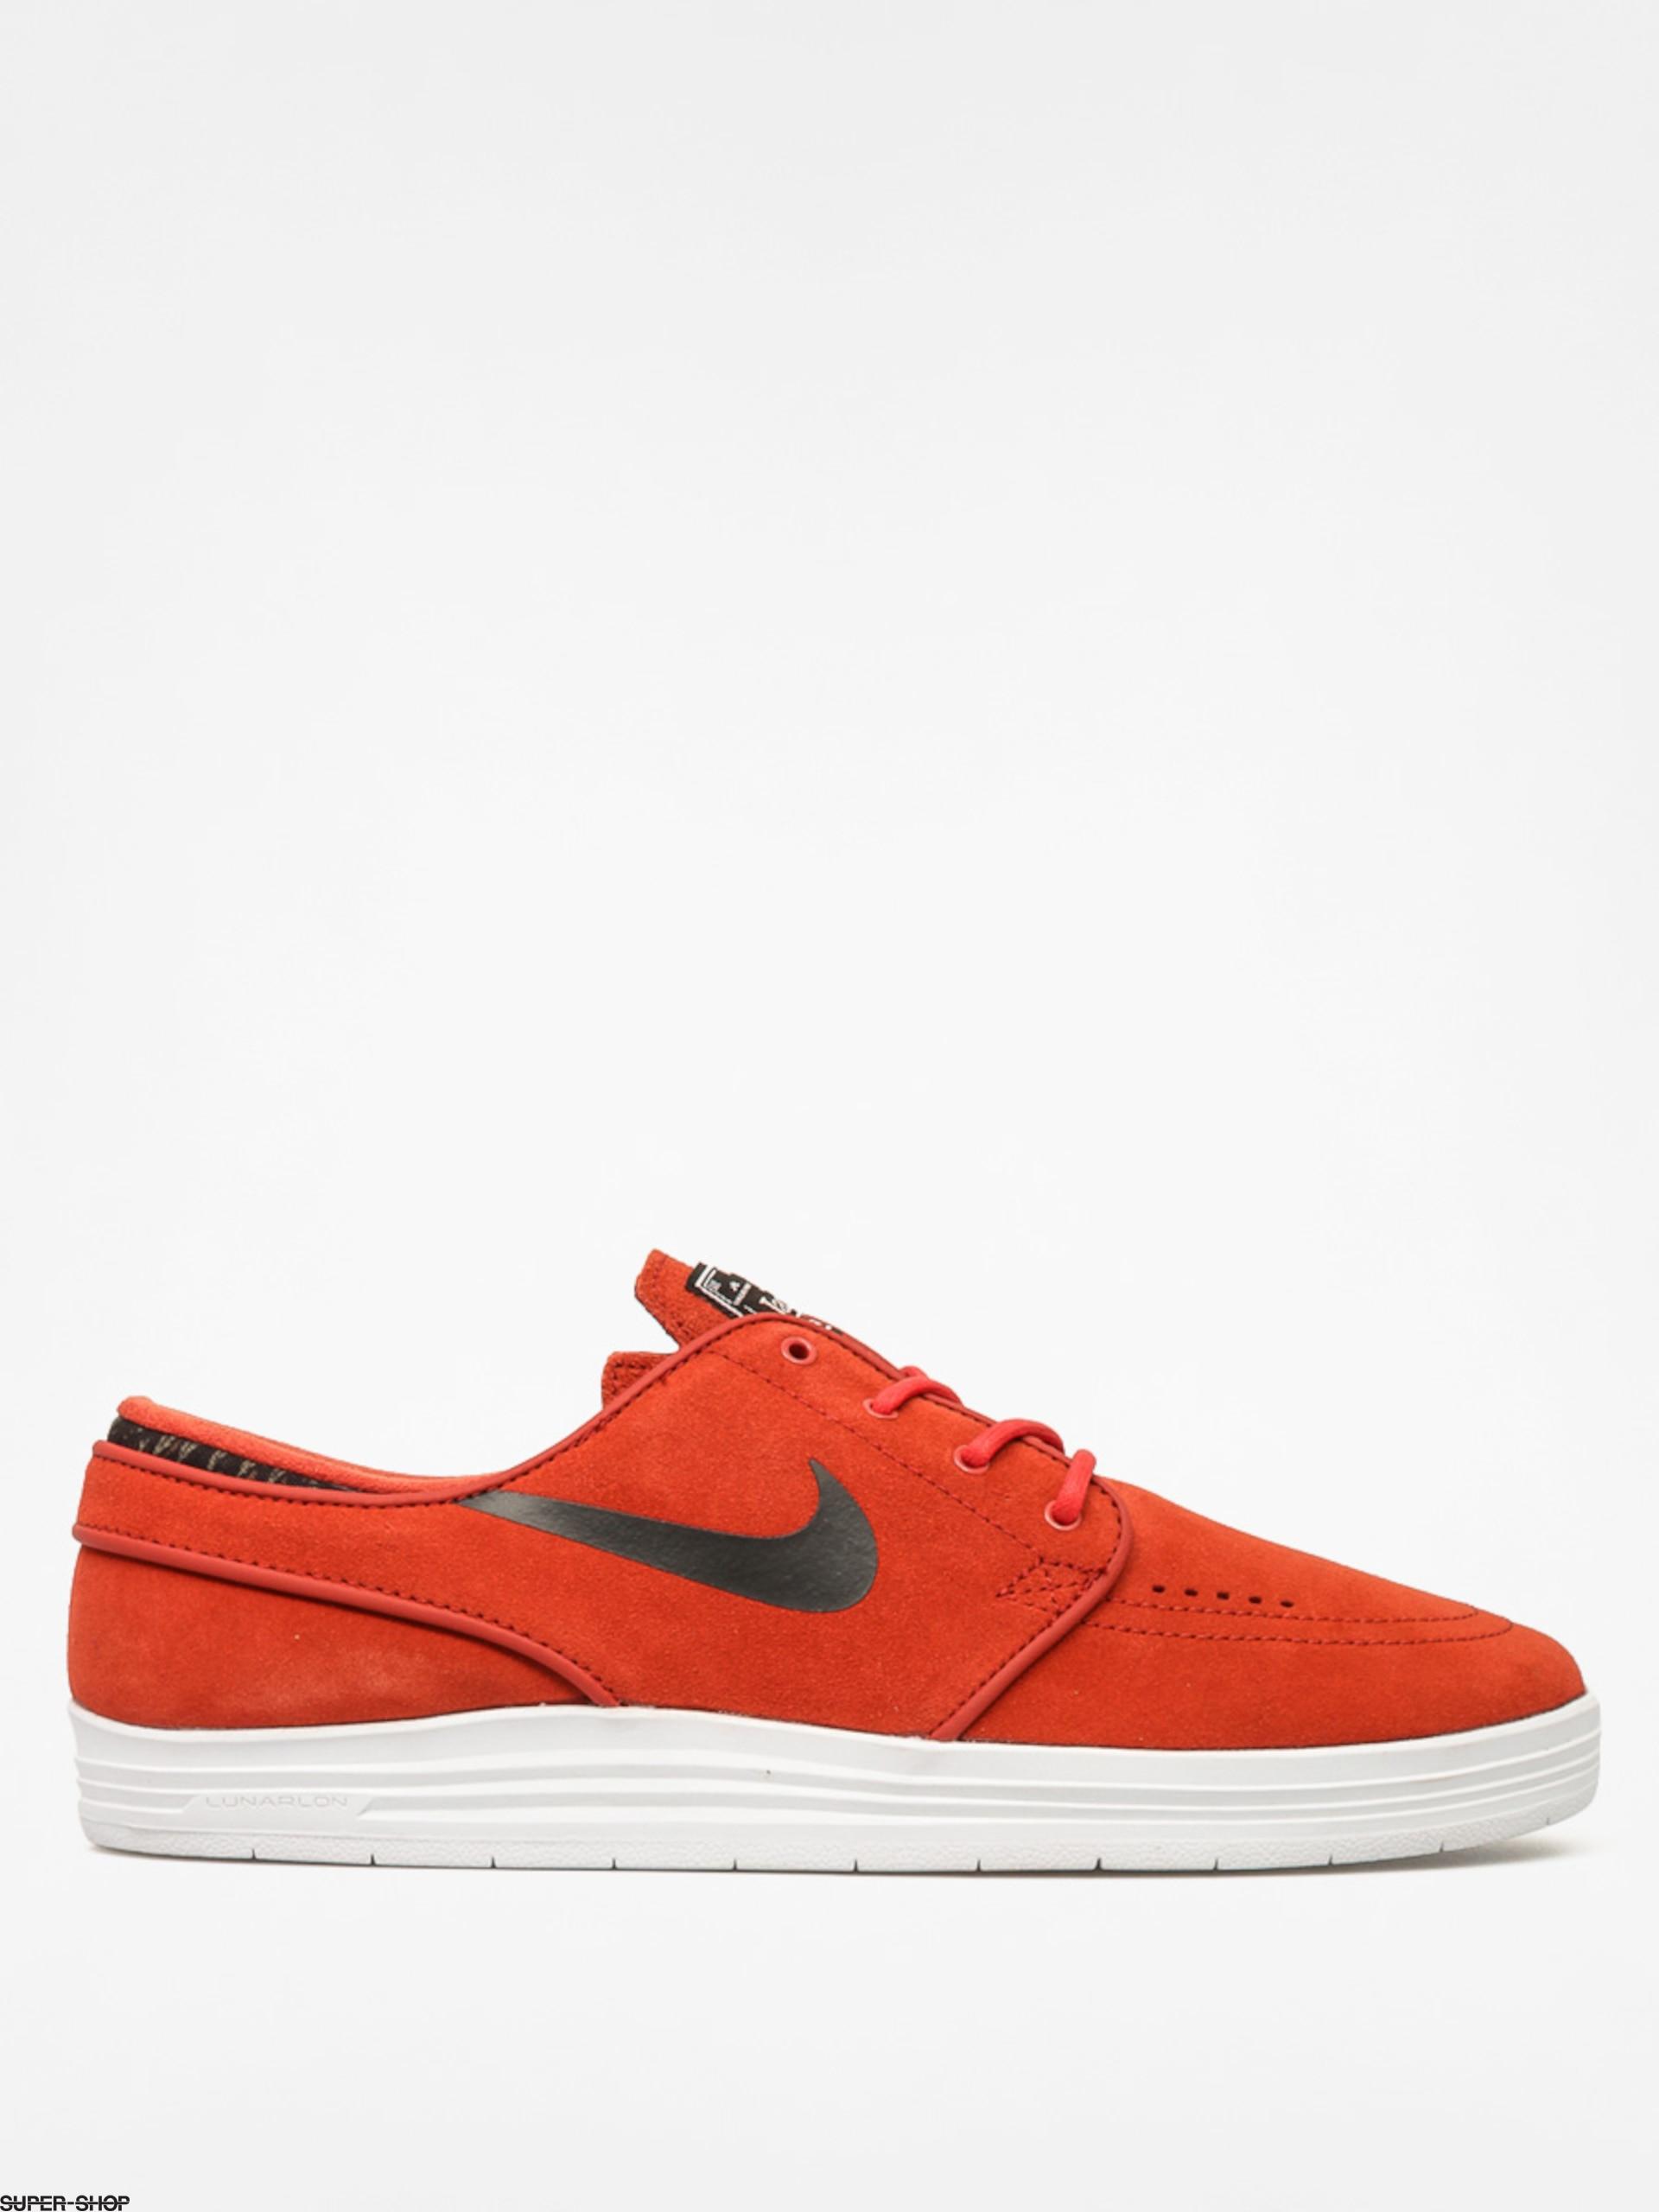 316b2d3bcca8 Nike SB Shoes Nike Lunar Stefan Janoski (cinnabar black medium olive)